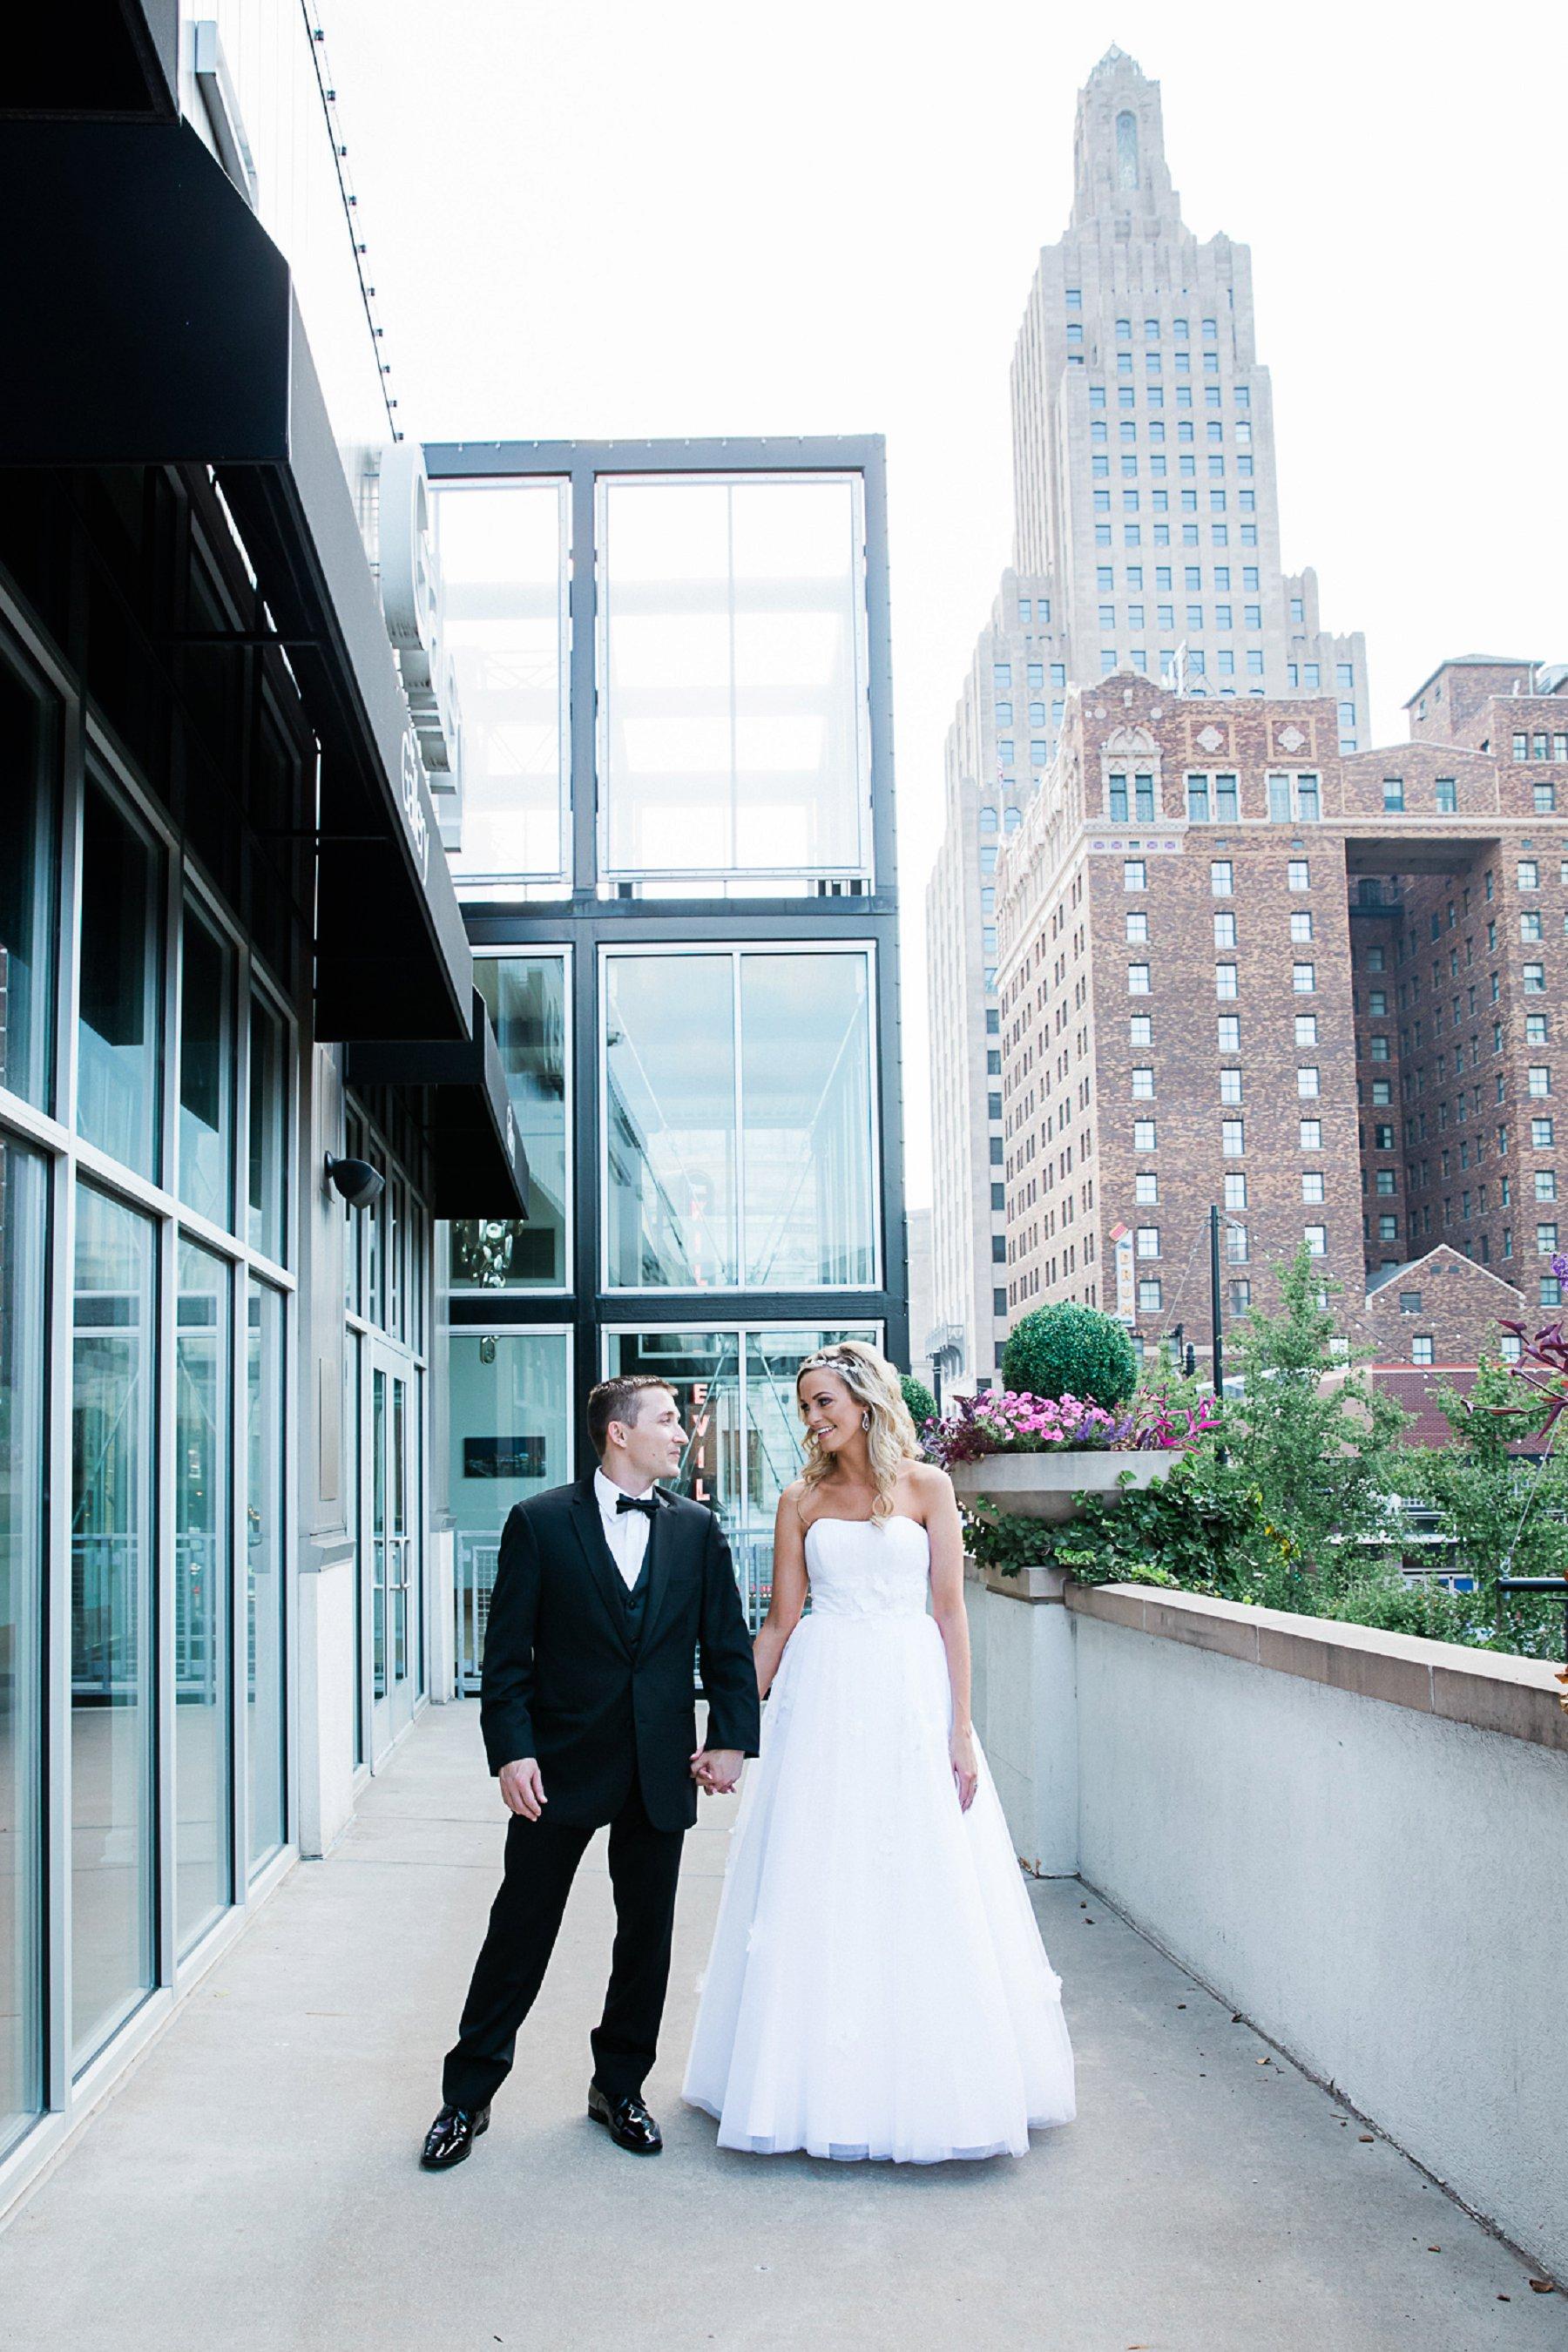 Bride and Groom Skyline Photography | Best Kansas Wedding Photographer Merry Ohler